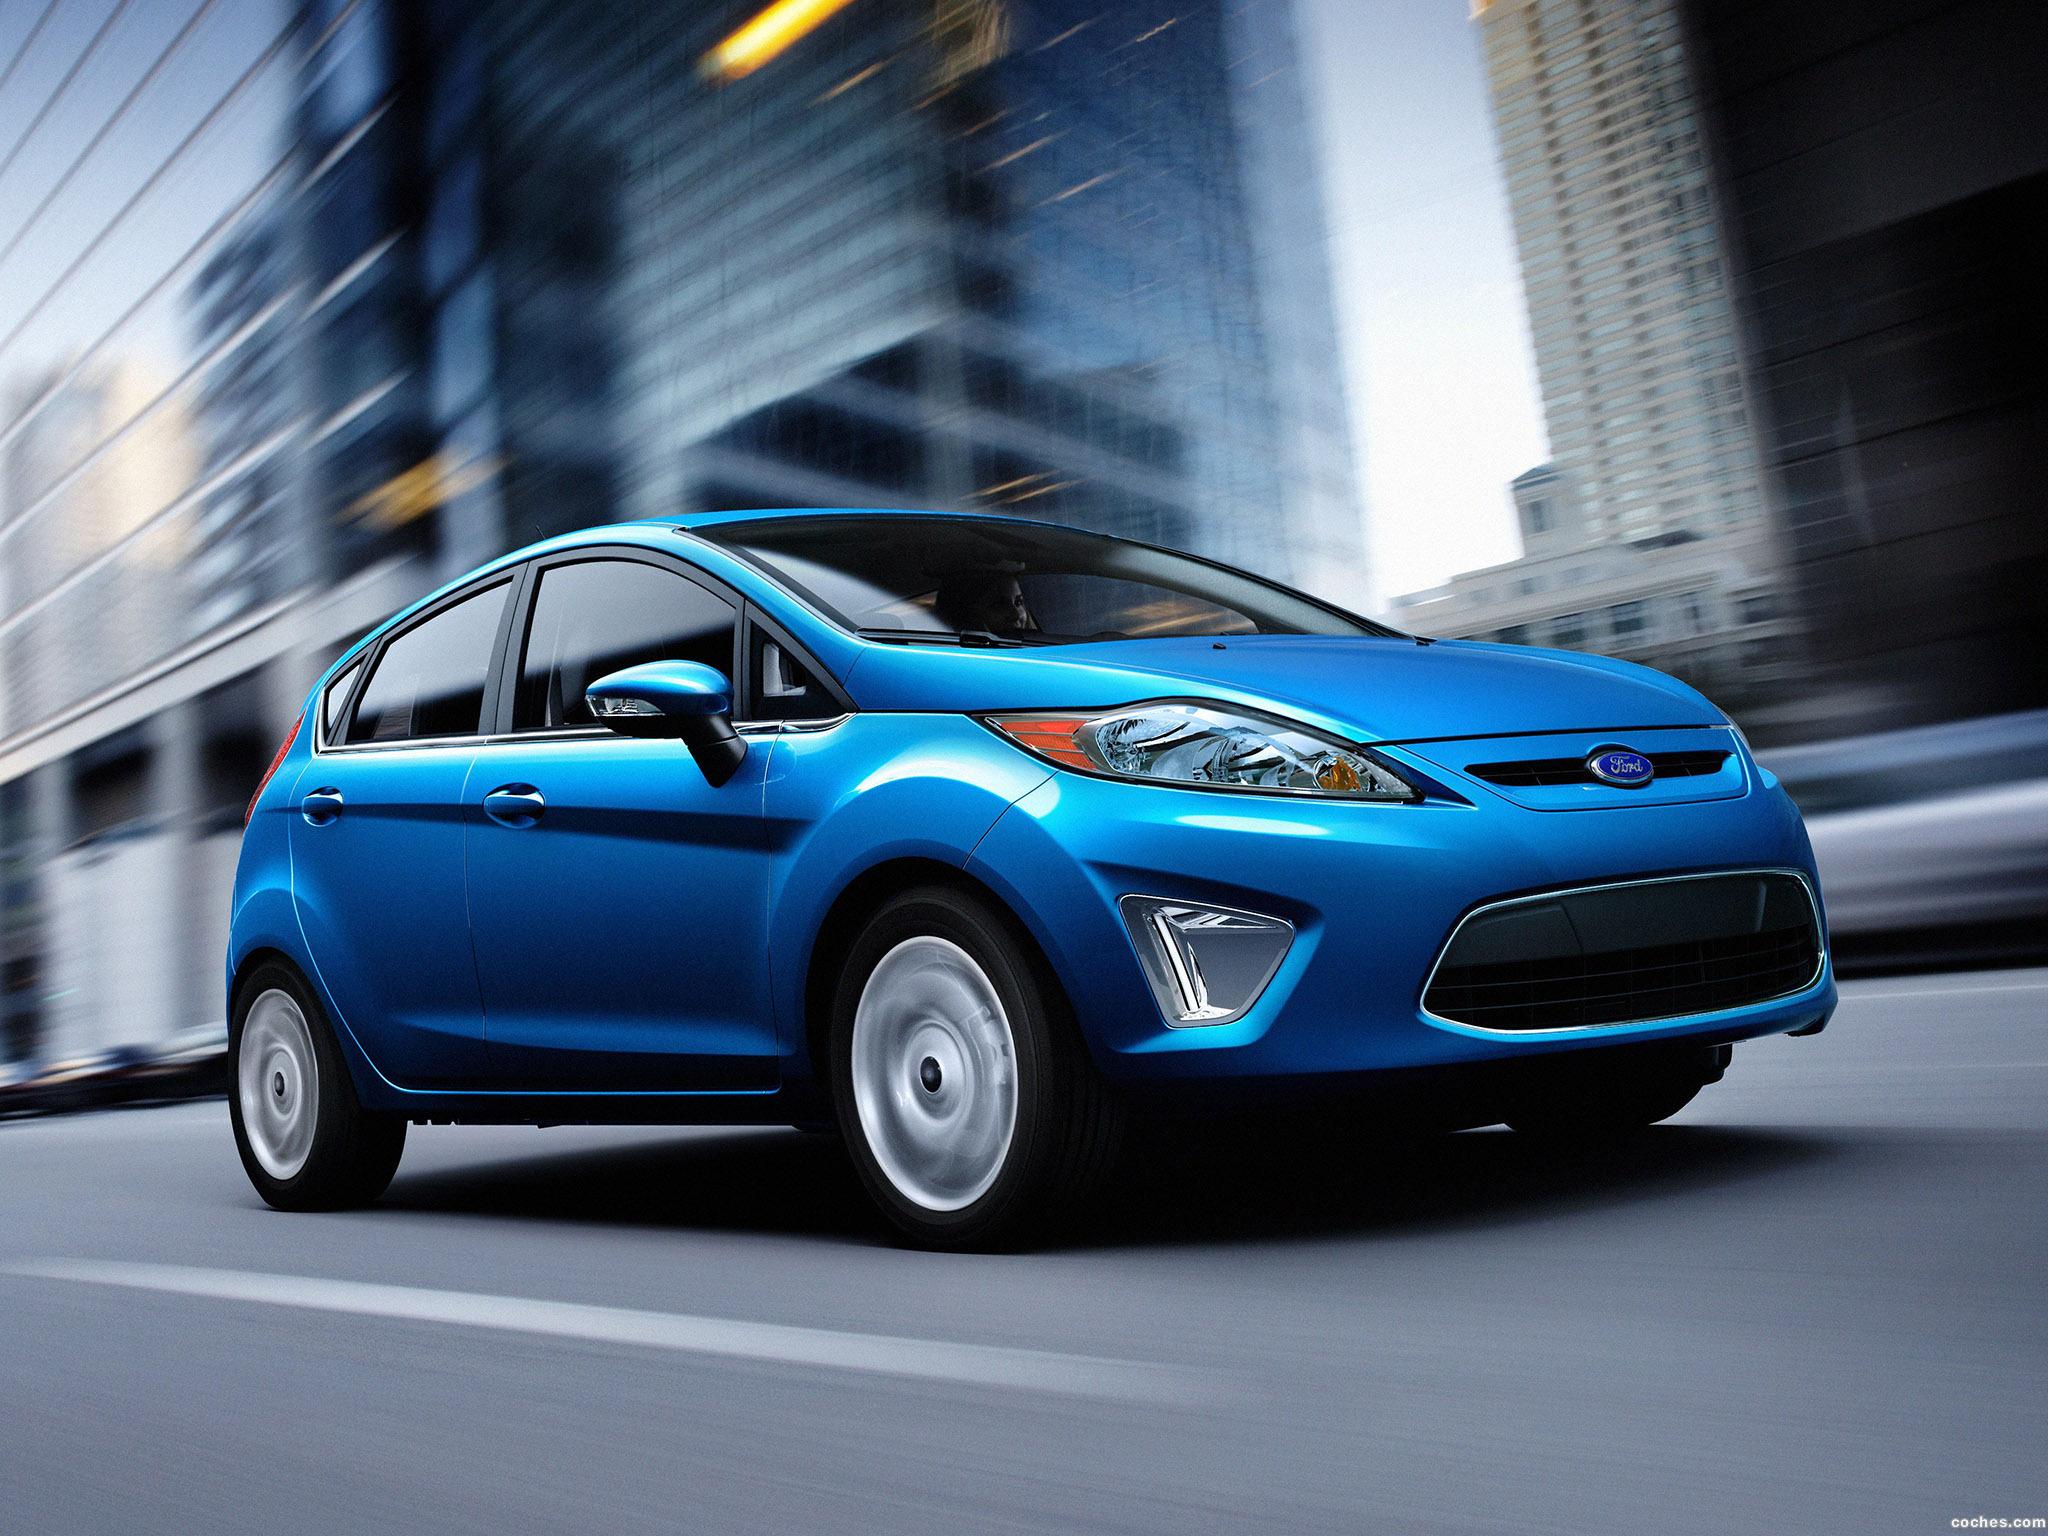 Foto 0 de Ford Fiesta Hatchback USA 2010